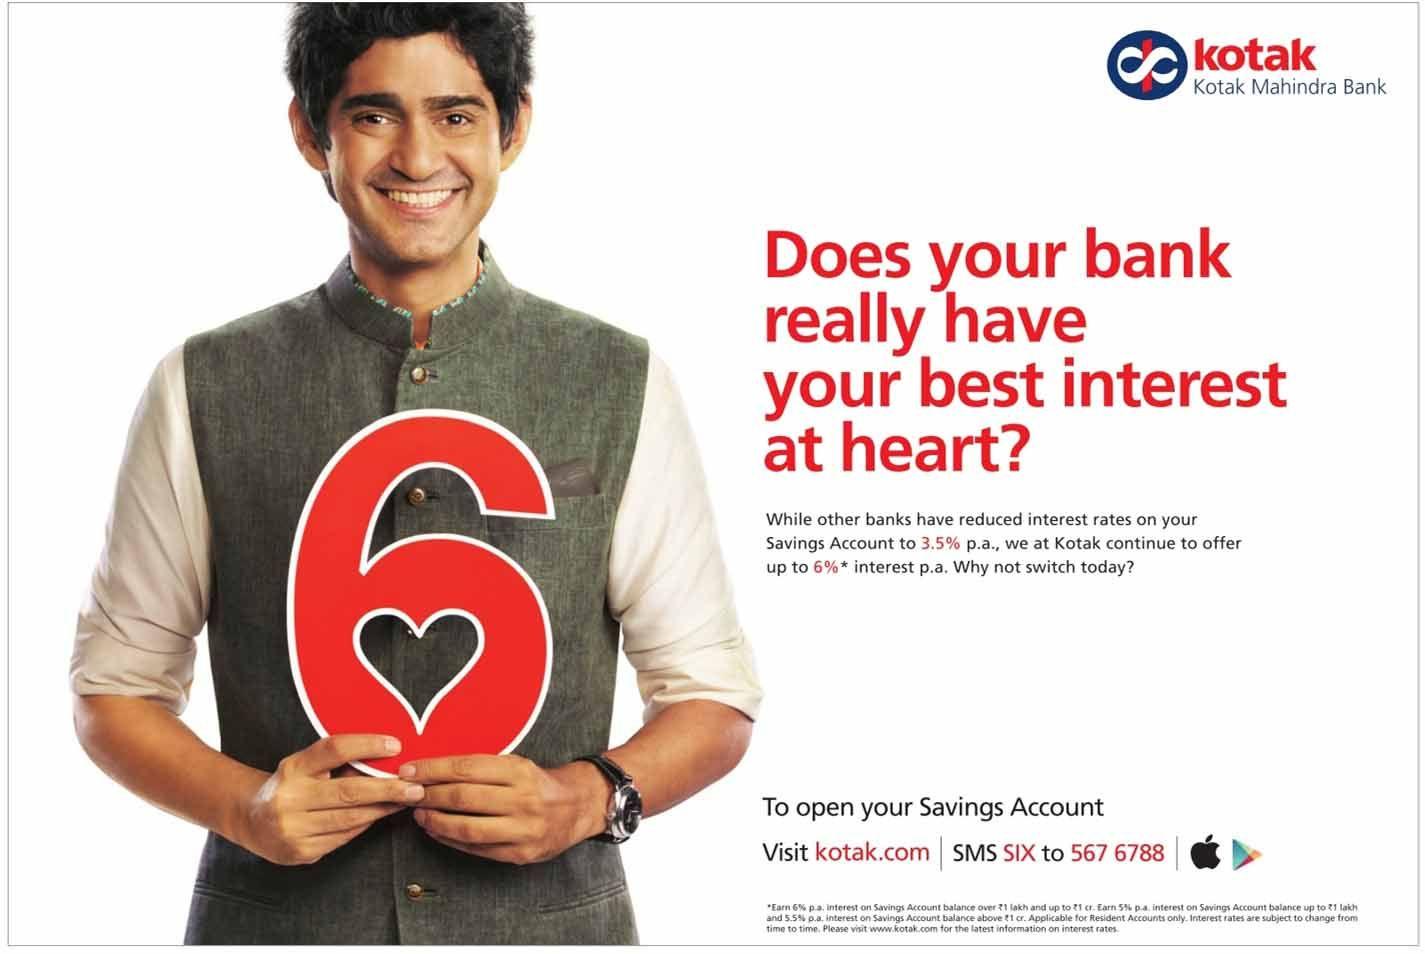 Kotak Mahindra Bank Offers 6 Interest On Savings Account Kotak Mahindra Bank Savings Account Accounting